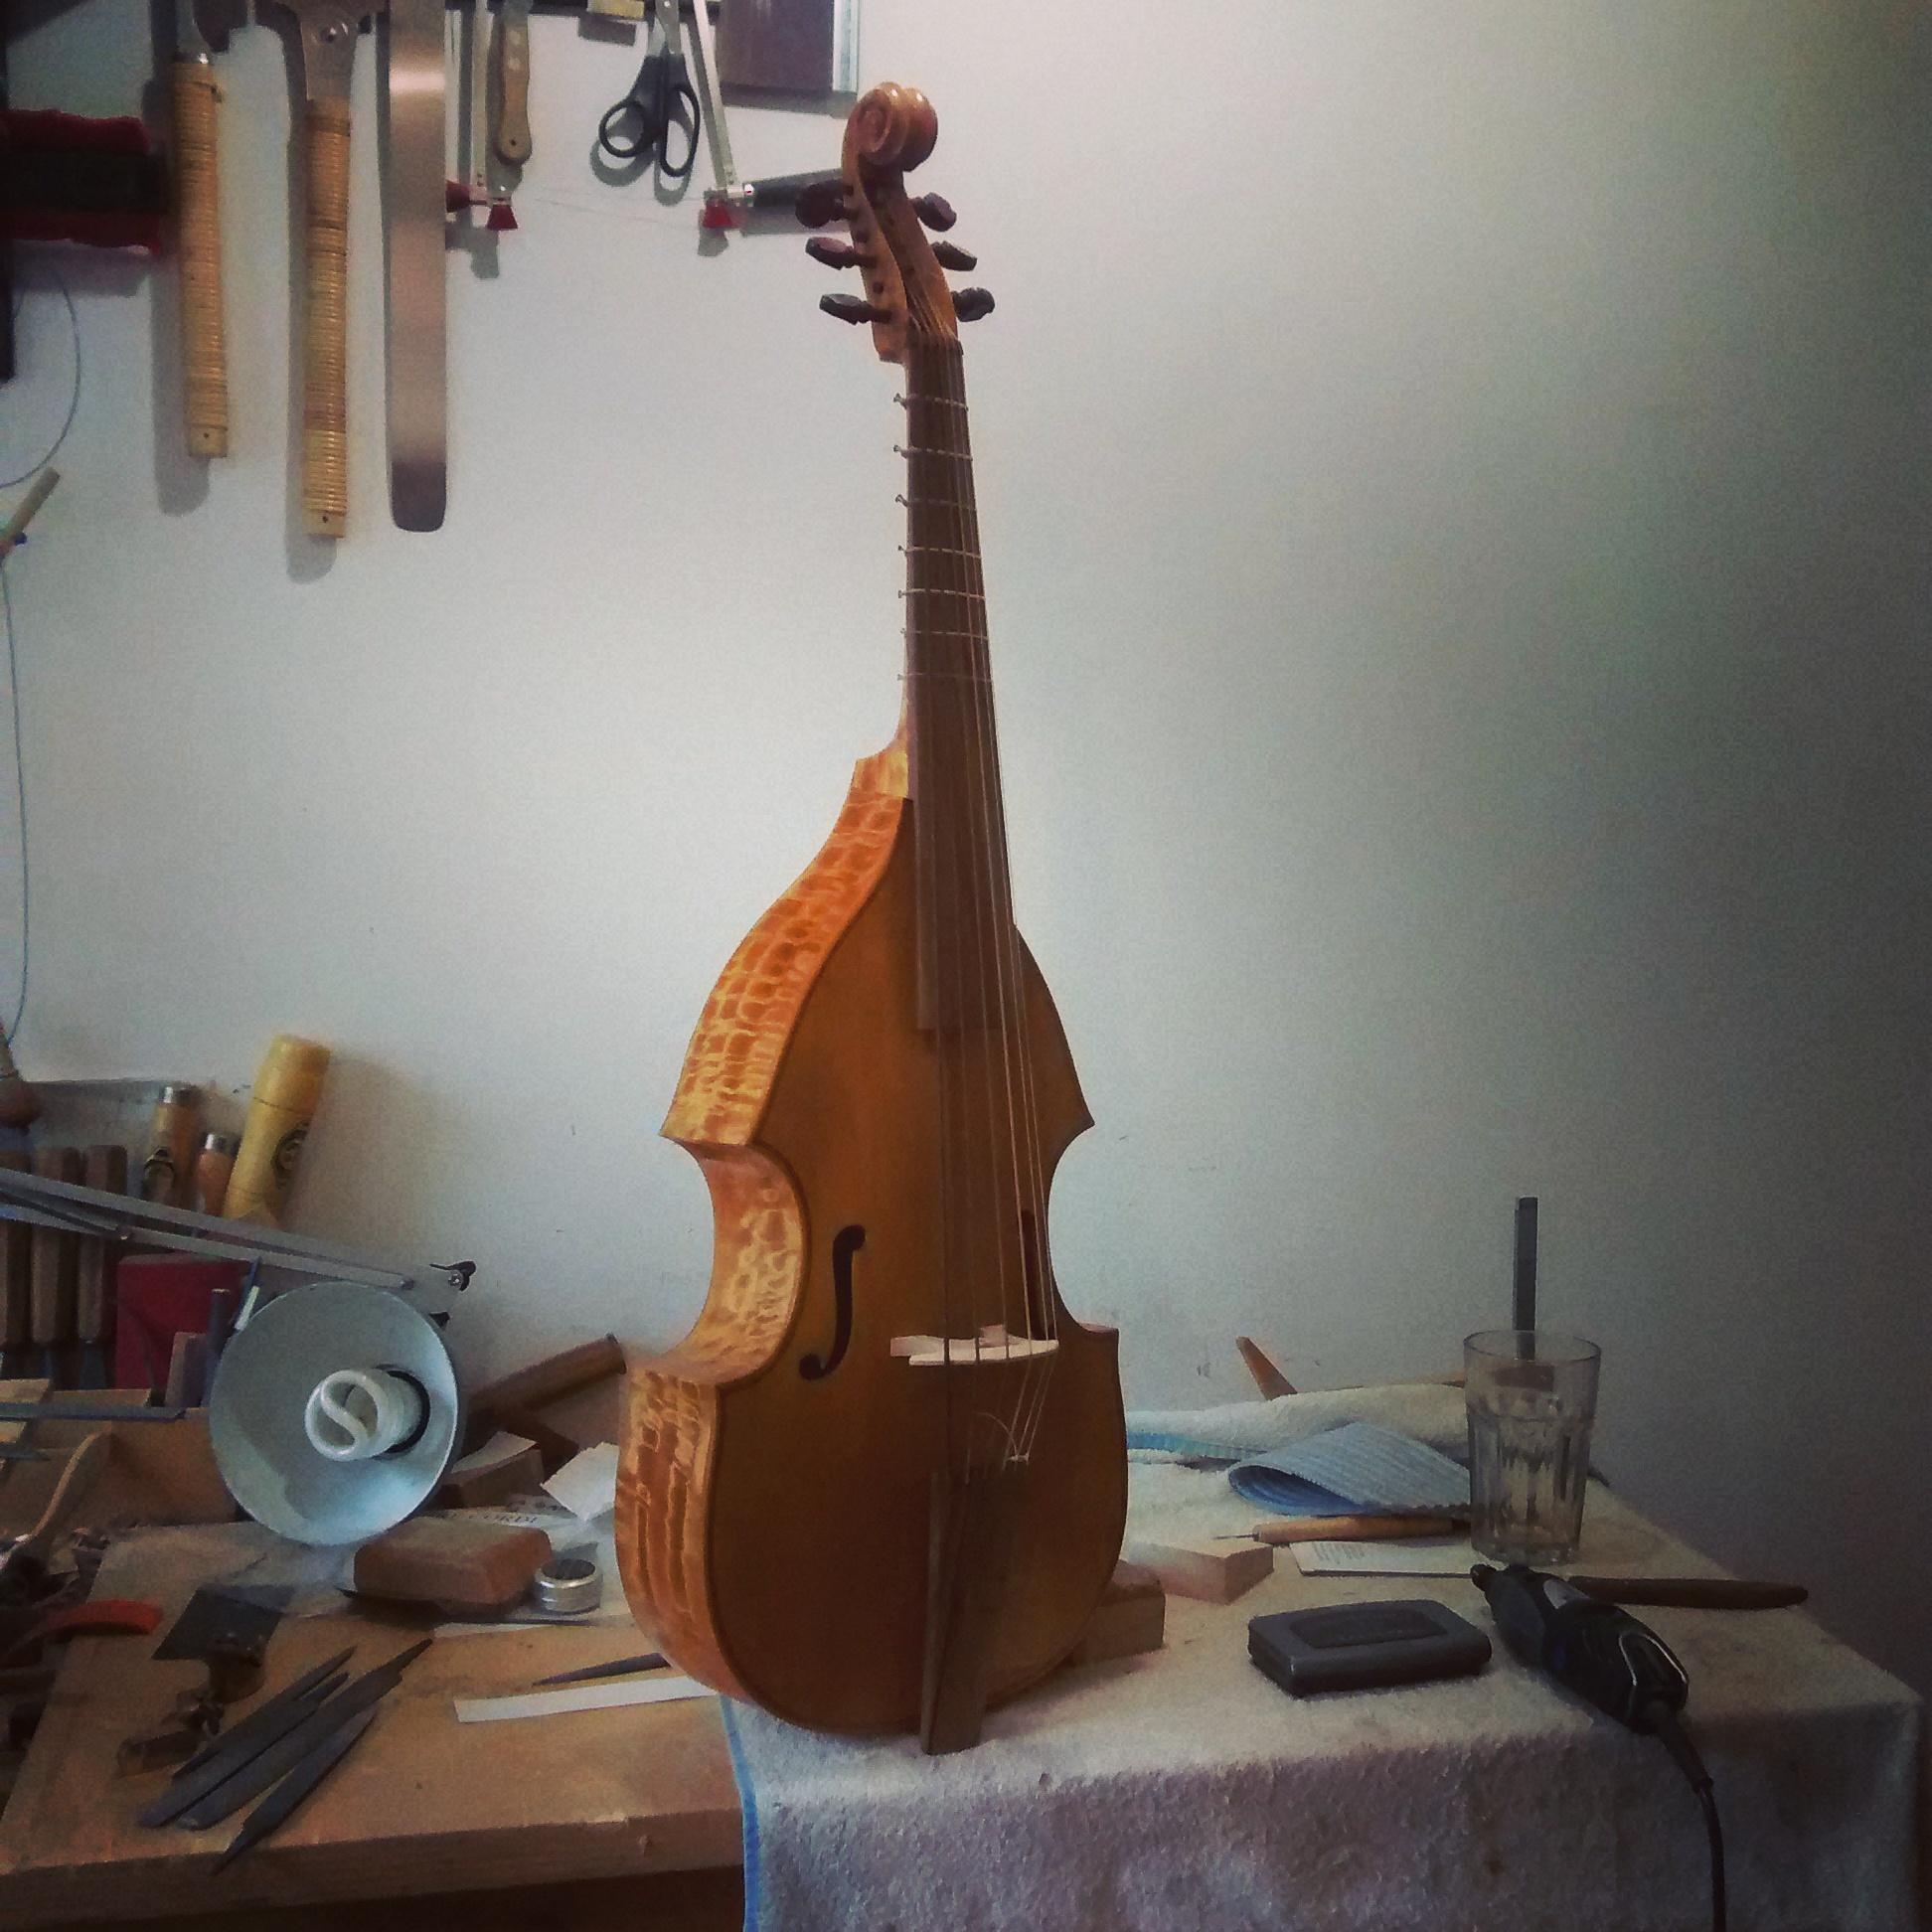 Ciciliano Tenor Viol  53cm string length All-gut stringing - NO SOUNDPOST  €2650 plus strings